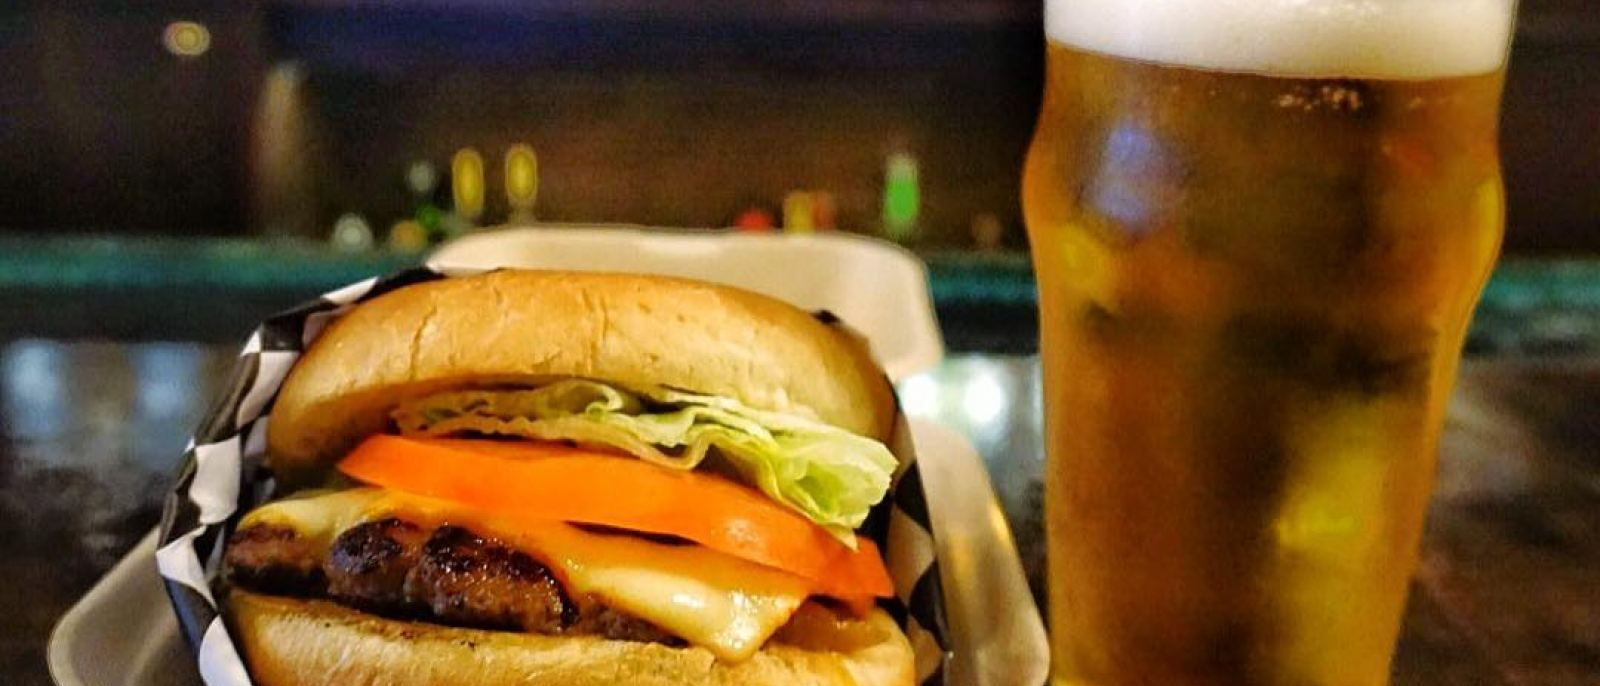 $10 Meatzilla cheeseburger and draft beer combo at Wendell